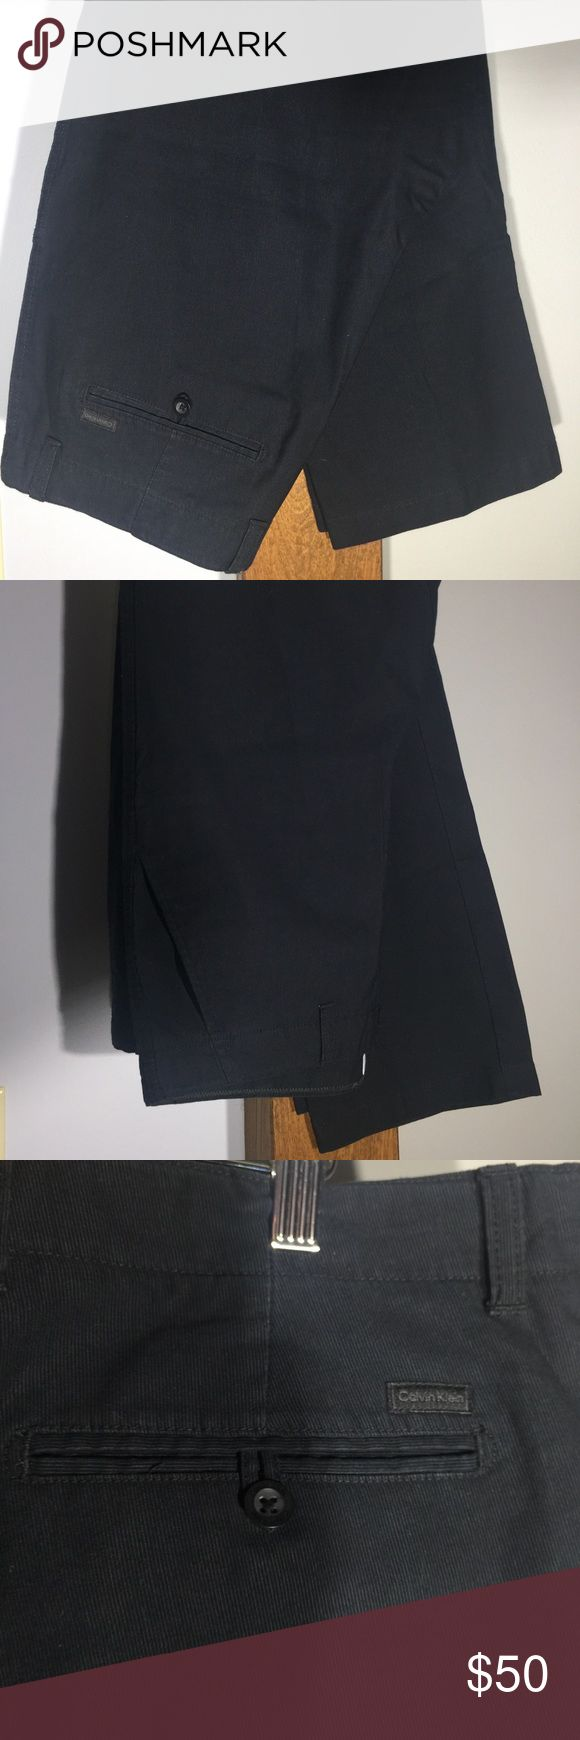 Calvin Klein Men's Corduroy Pants Black Calvin Klein men's corduroy pants. 100% cotton. Never worn. Calvin Klein Pants Corduroy